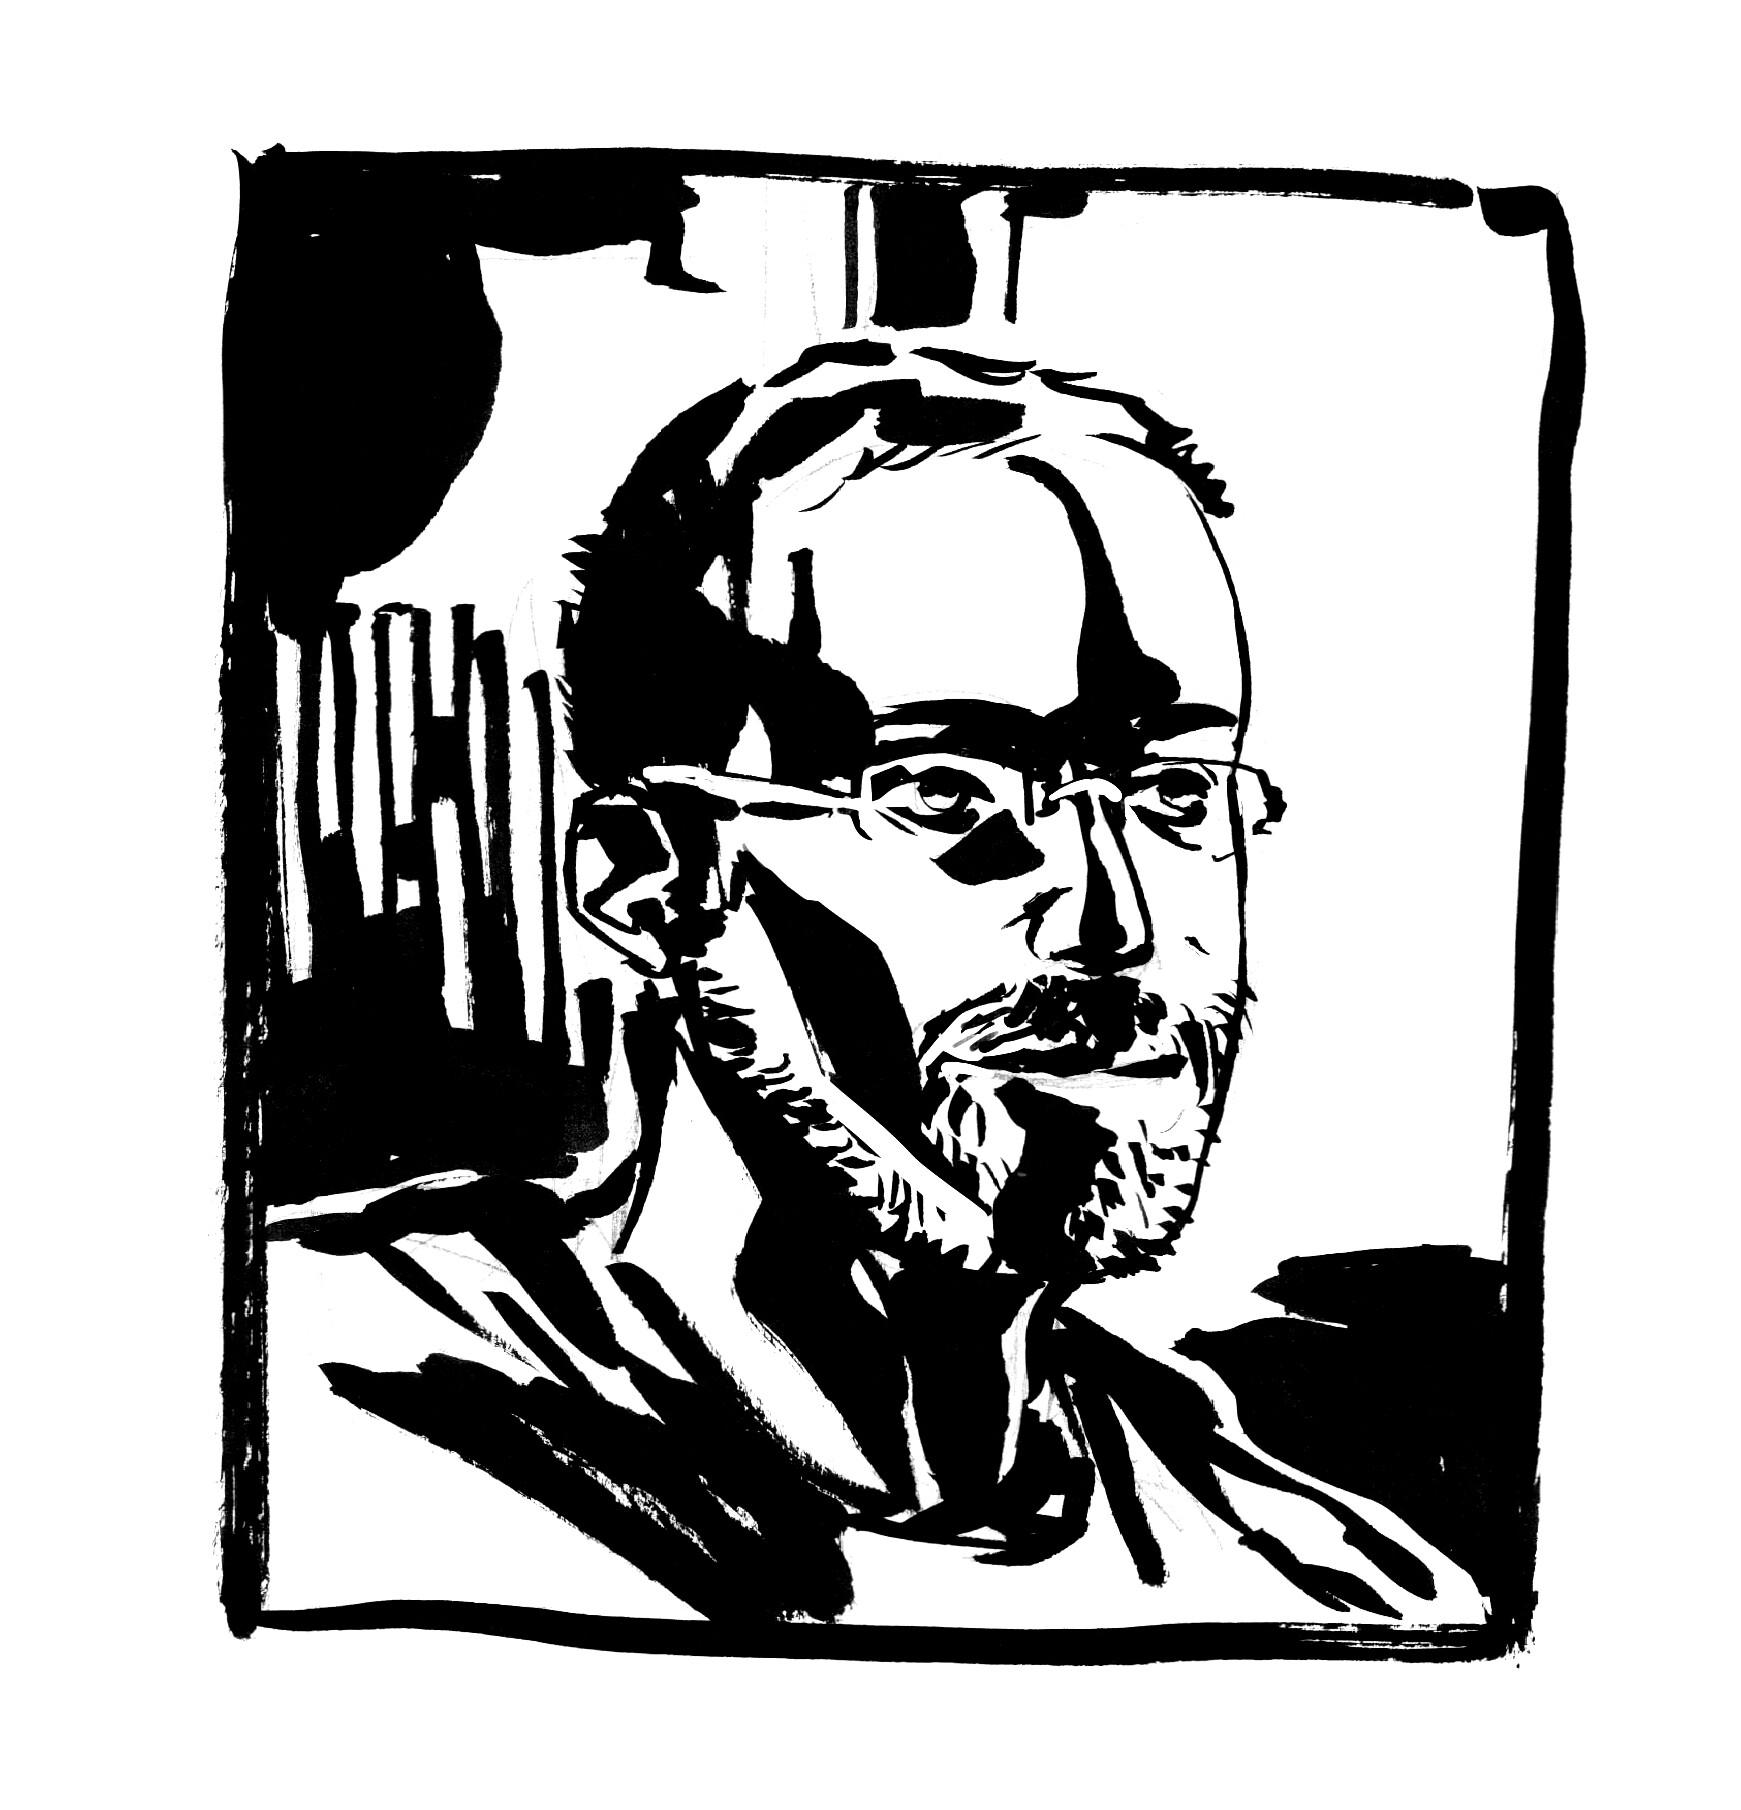 Bonus - friend drawn from memory